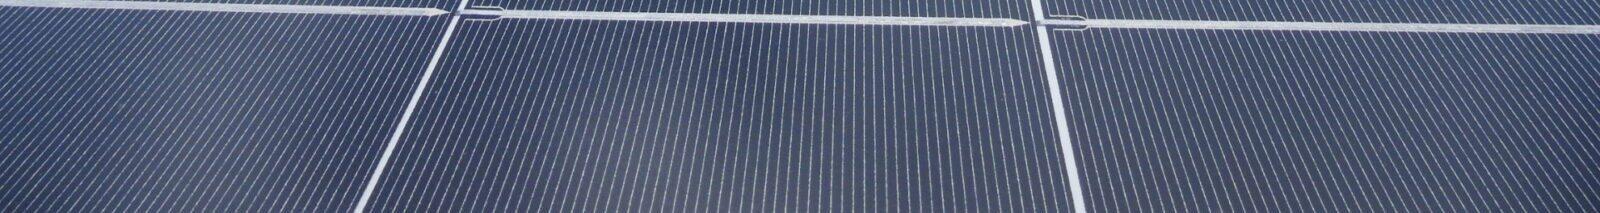 panel solarny - fotowoltaika